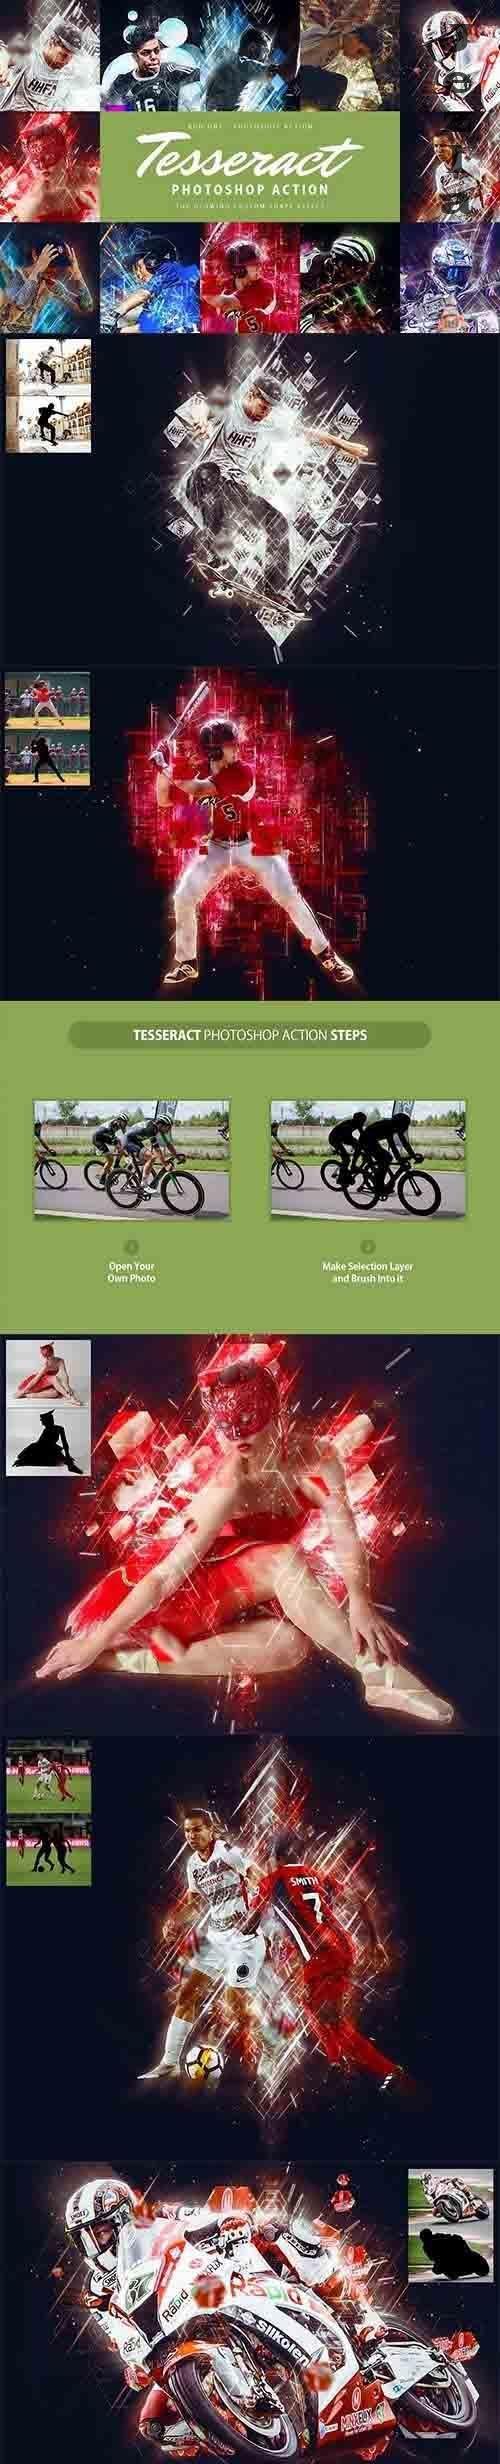 CreativeMarket - Tesseract Photoshop Action 4284639